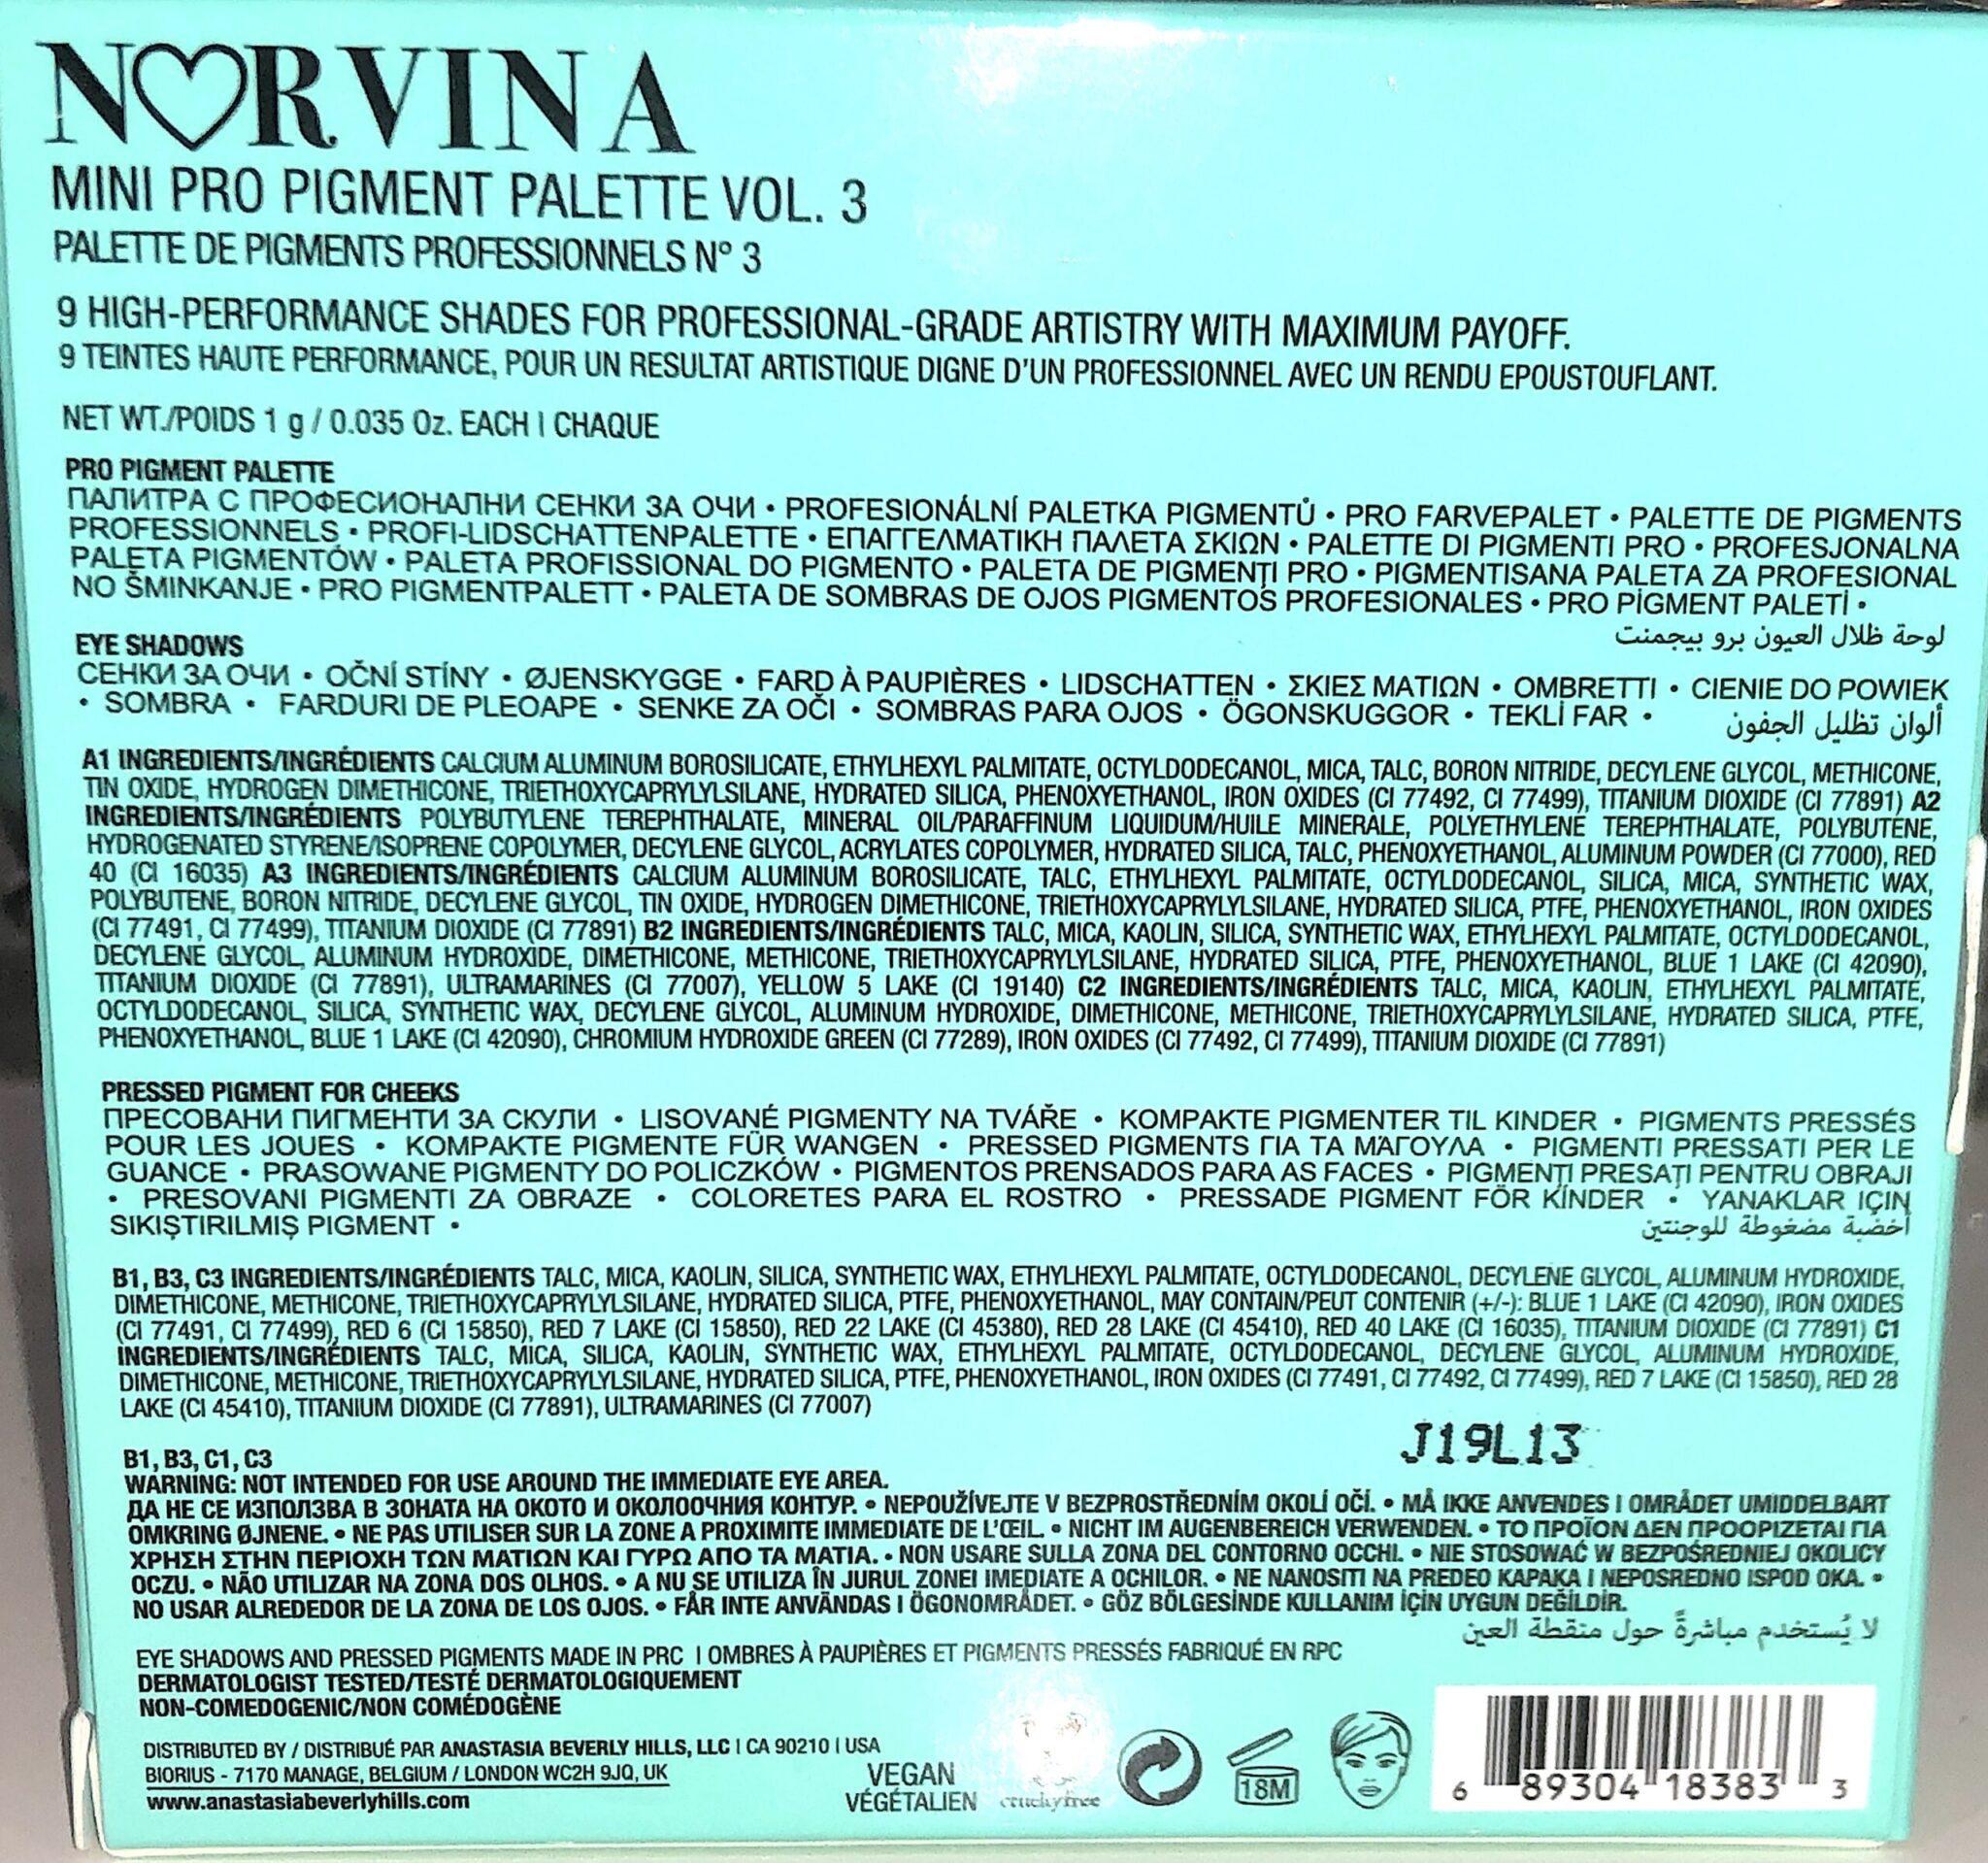 MINI NORVINA COLLECTION INGREDIENTS VOLUME 3